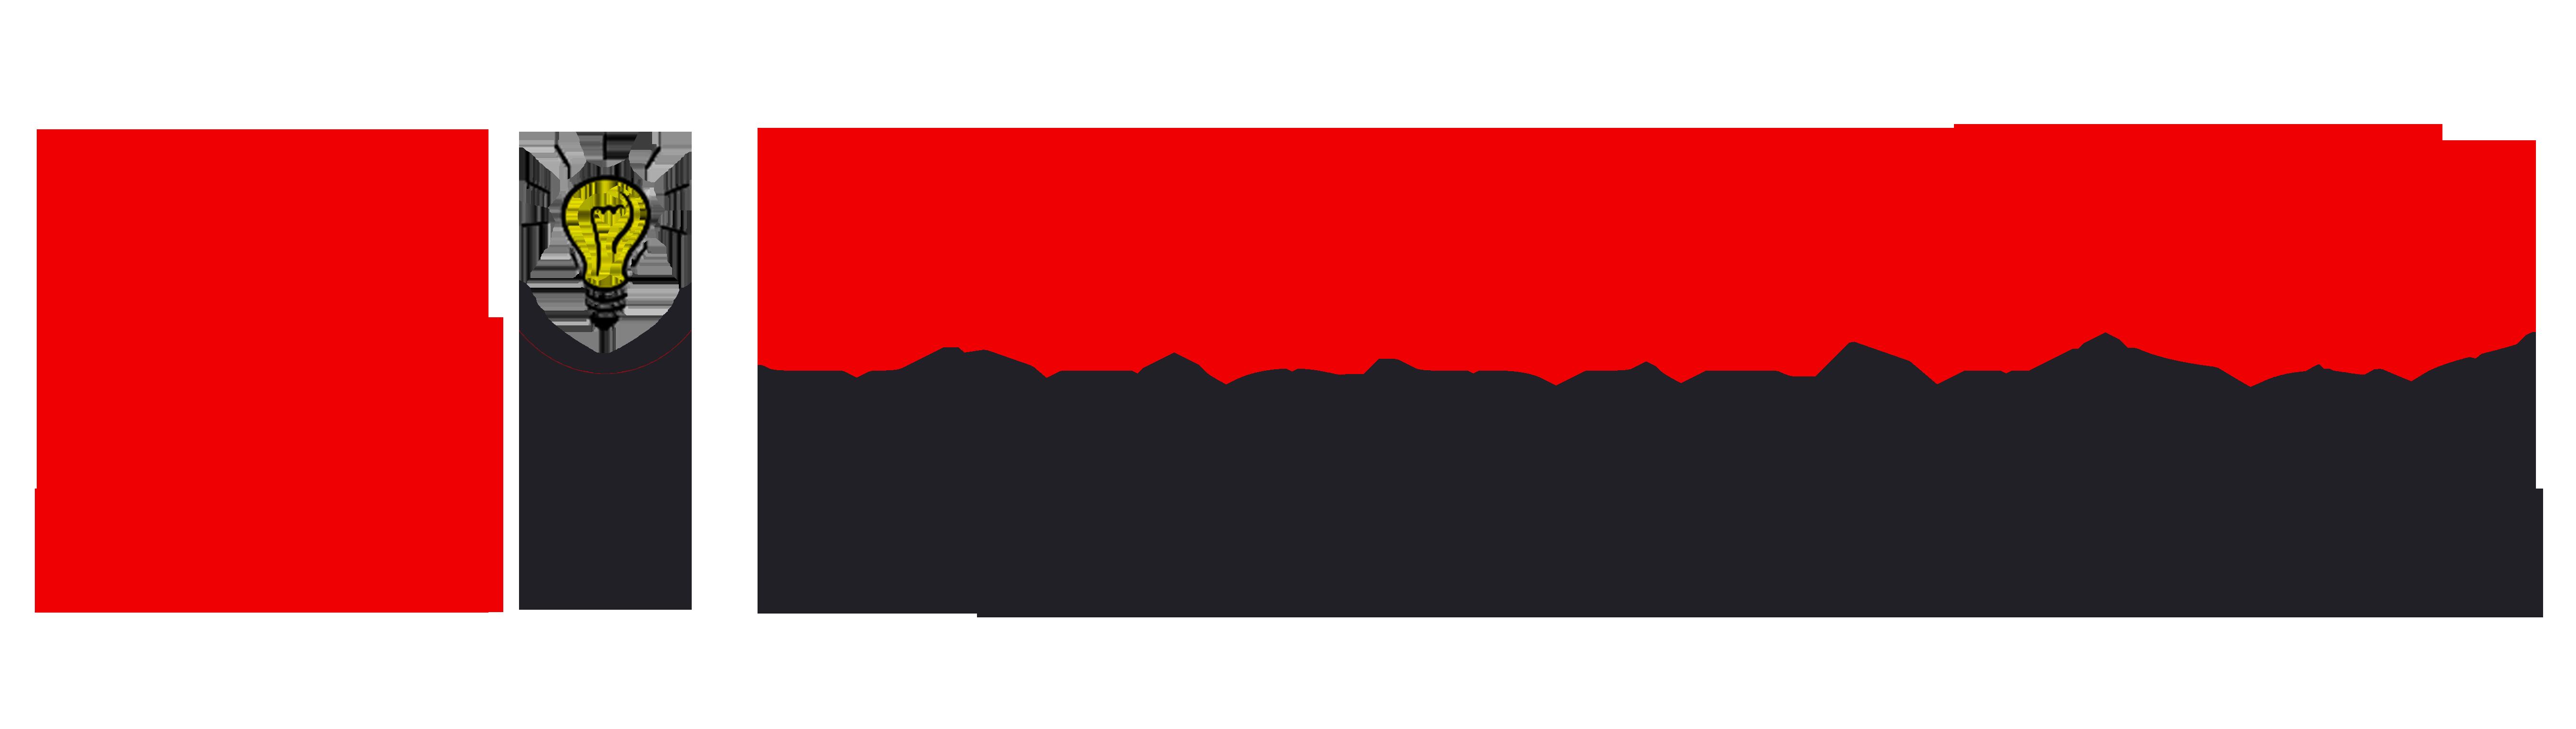 Nano informatics logo